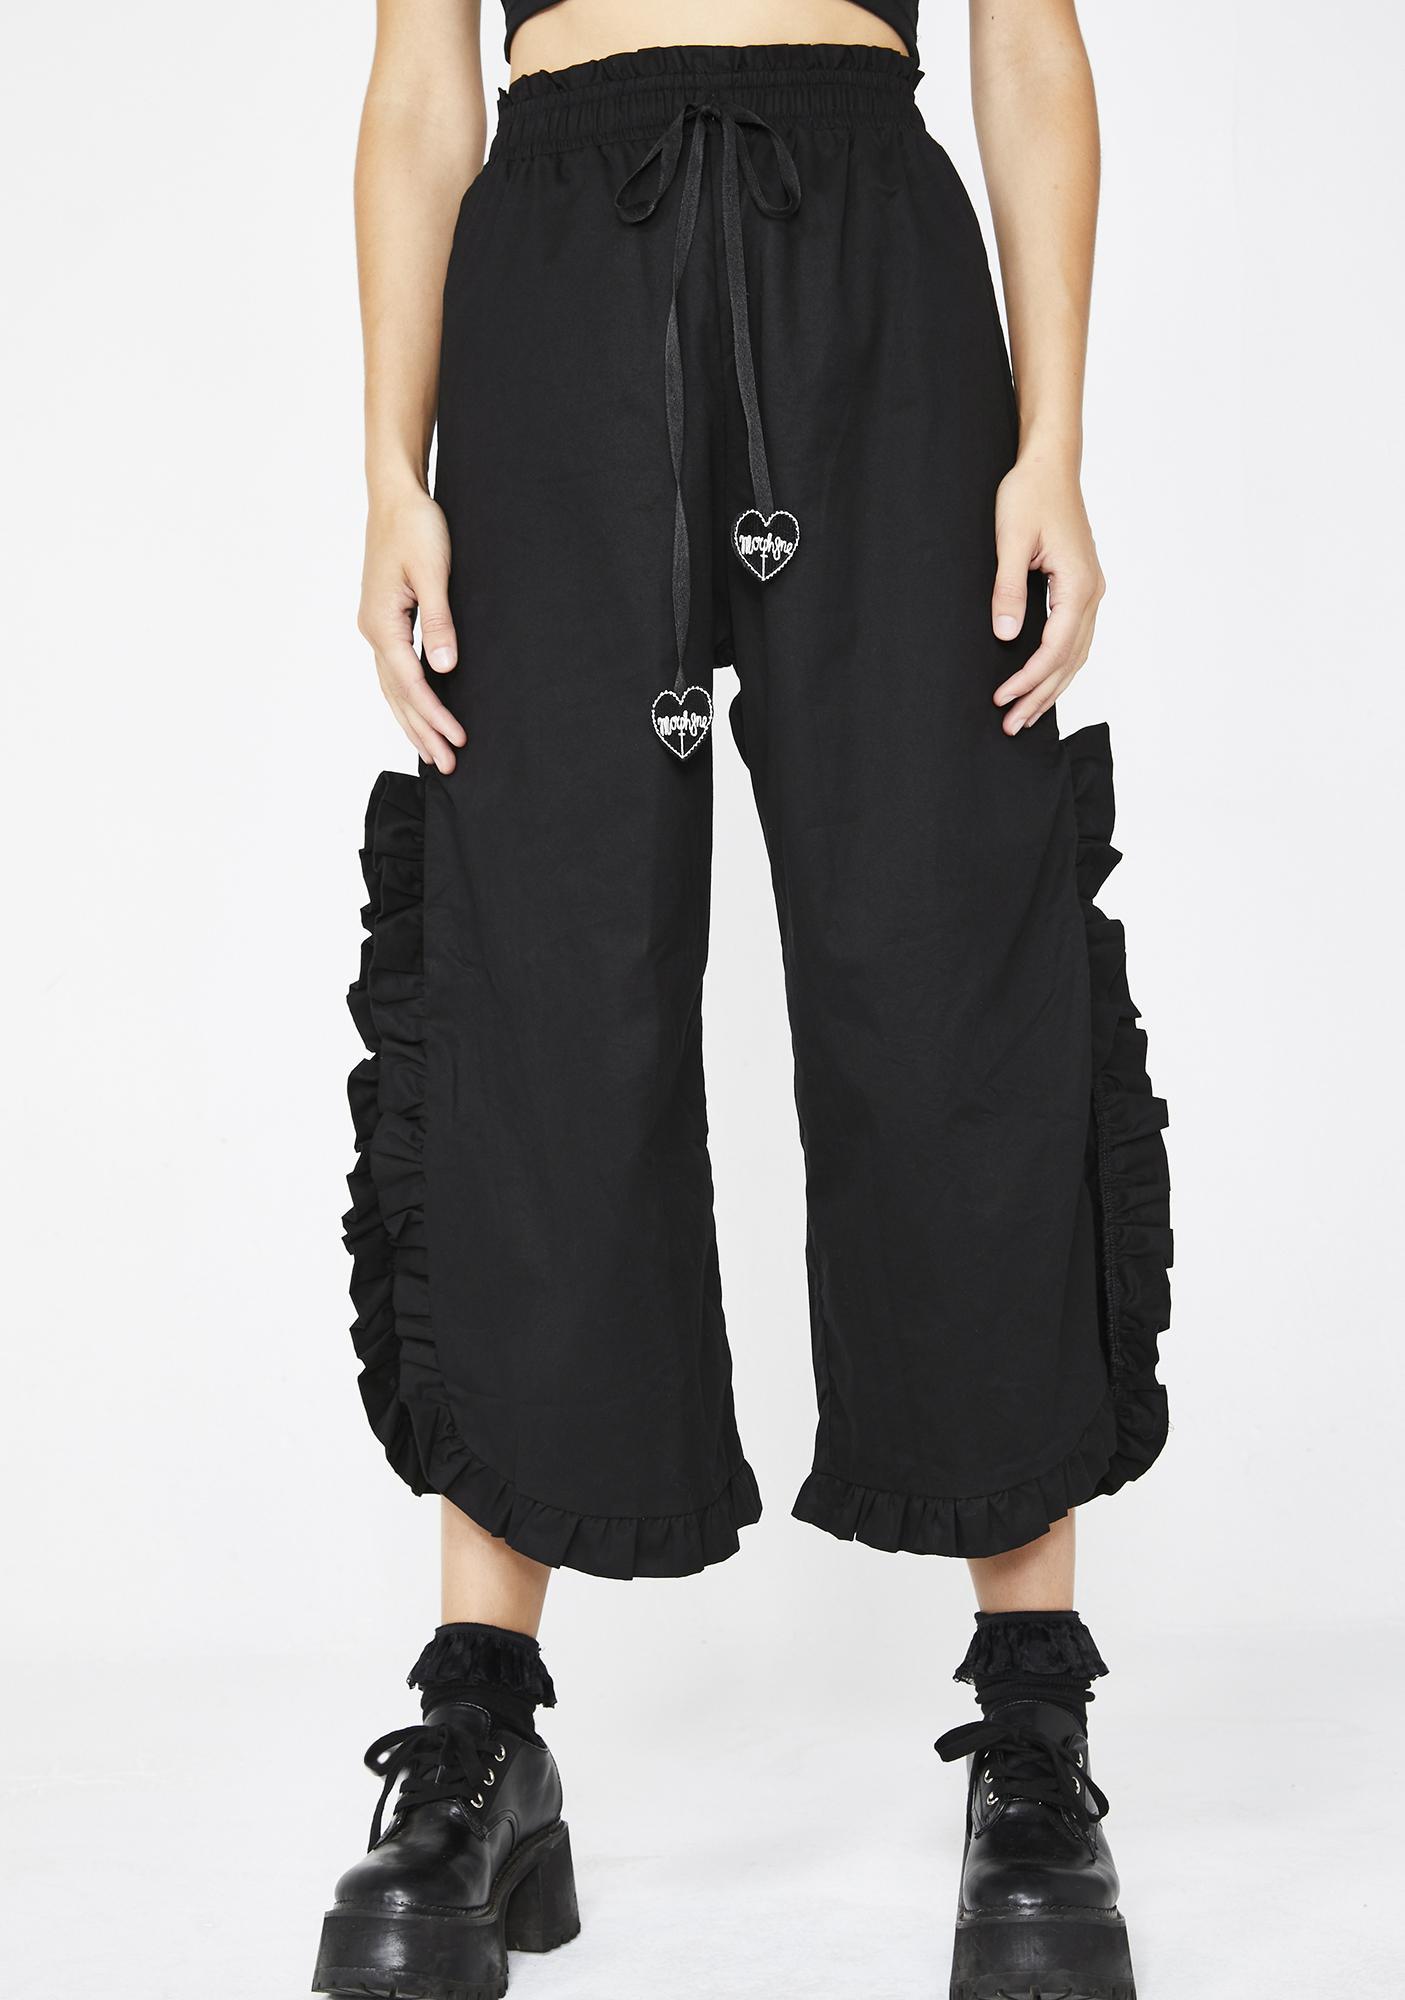 Morph8ne Daisy-ing Pants